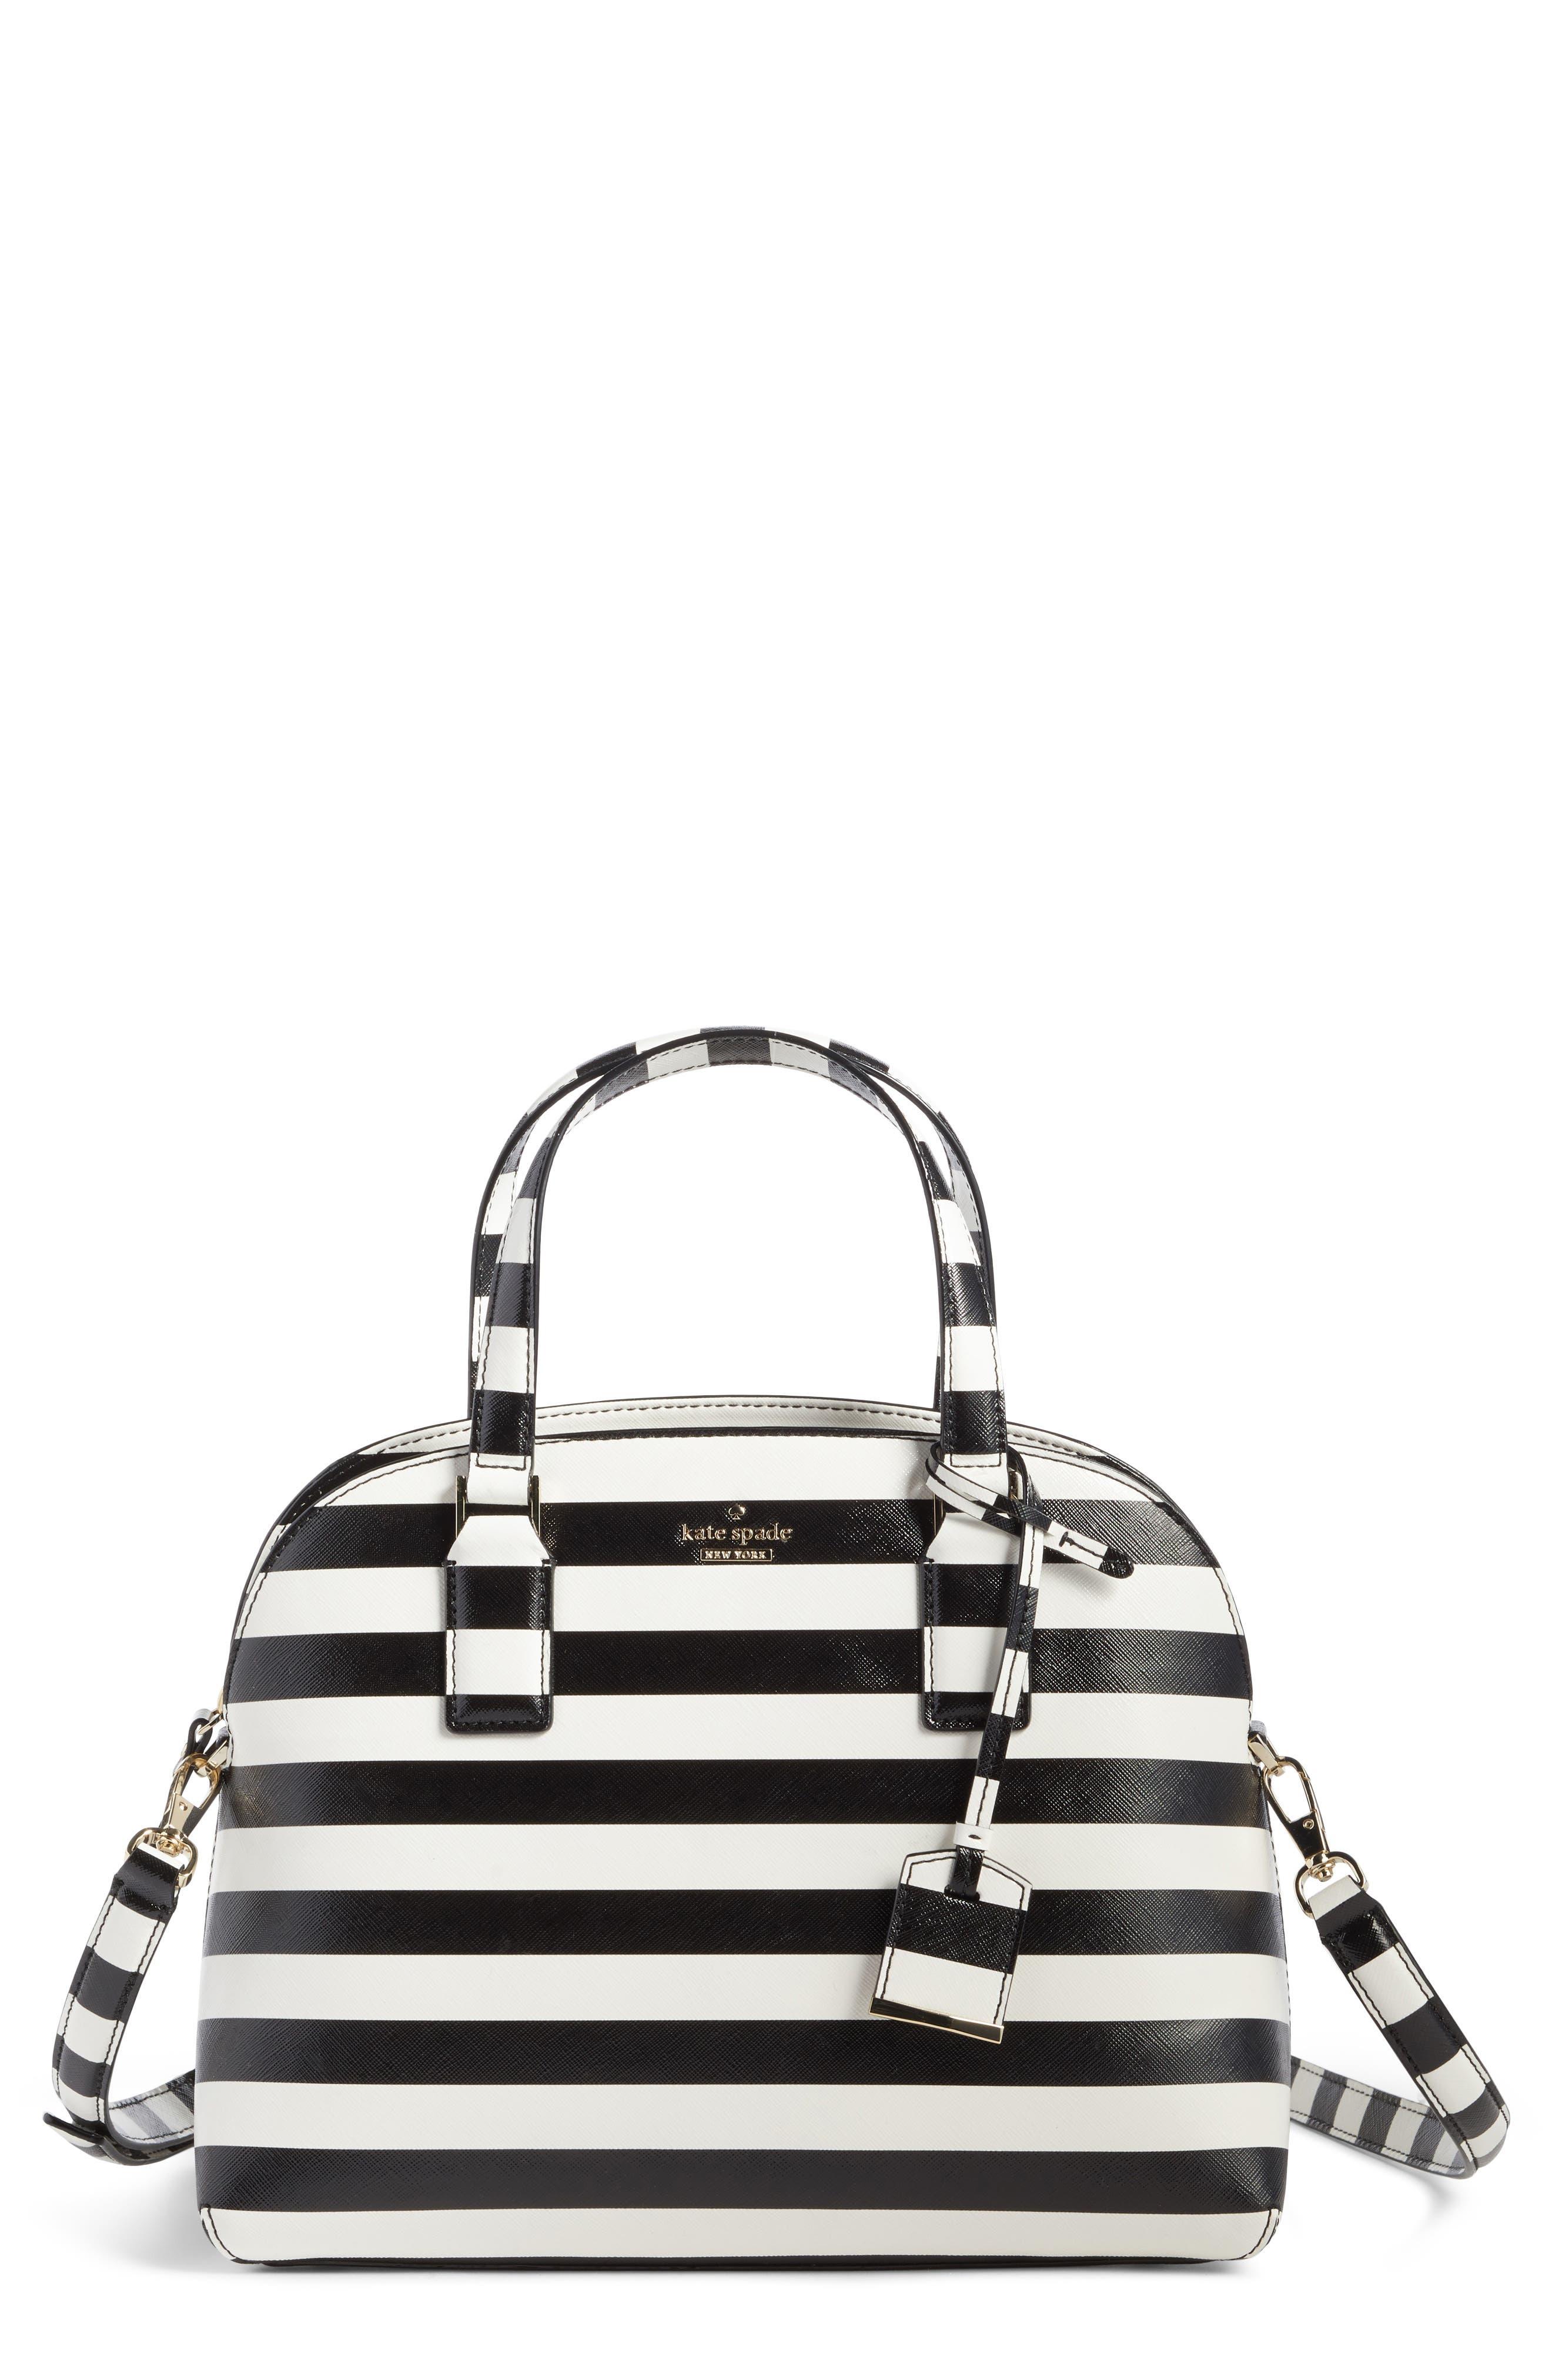 Kate Spade Blue And White Striped Handbag Handbags 2018